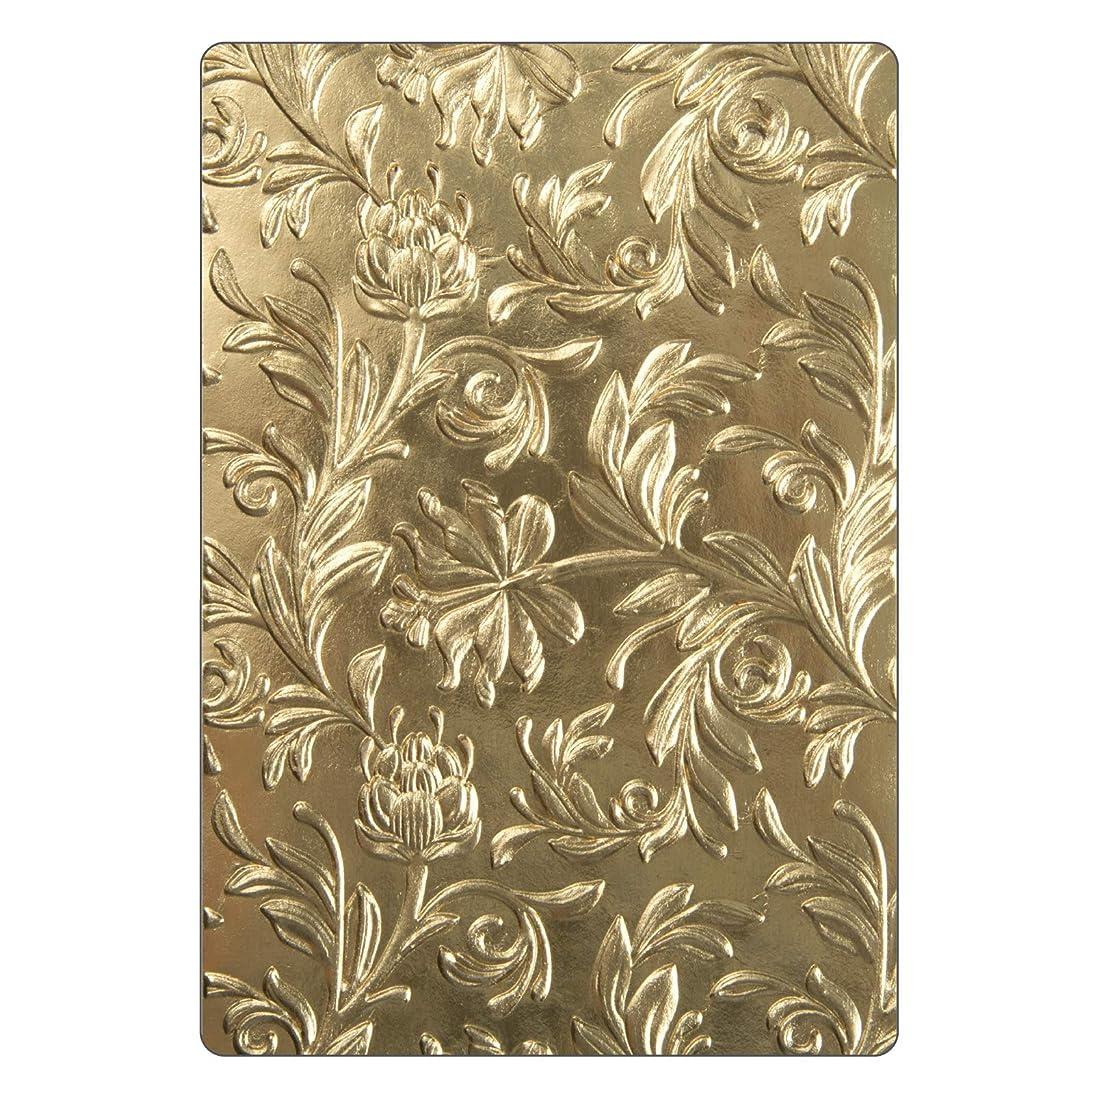 Sizzix 662716 3-D Texture Fades Embossing Folder, Gold